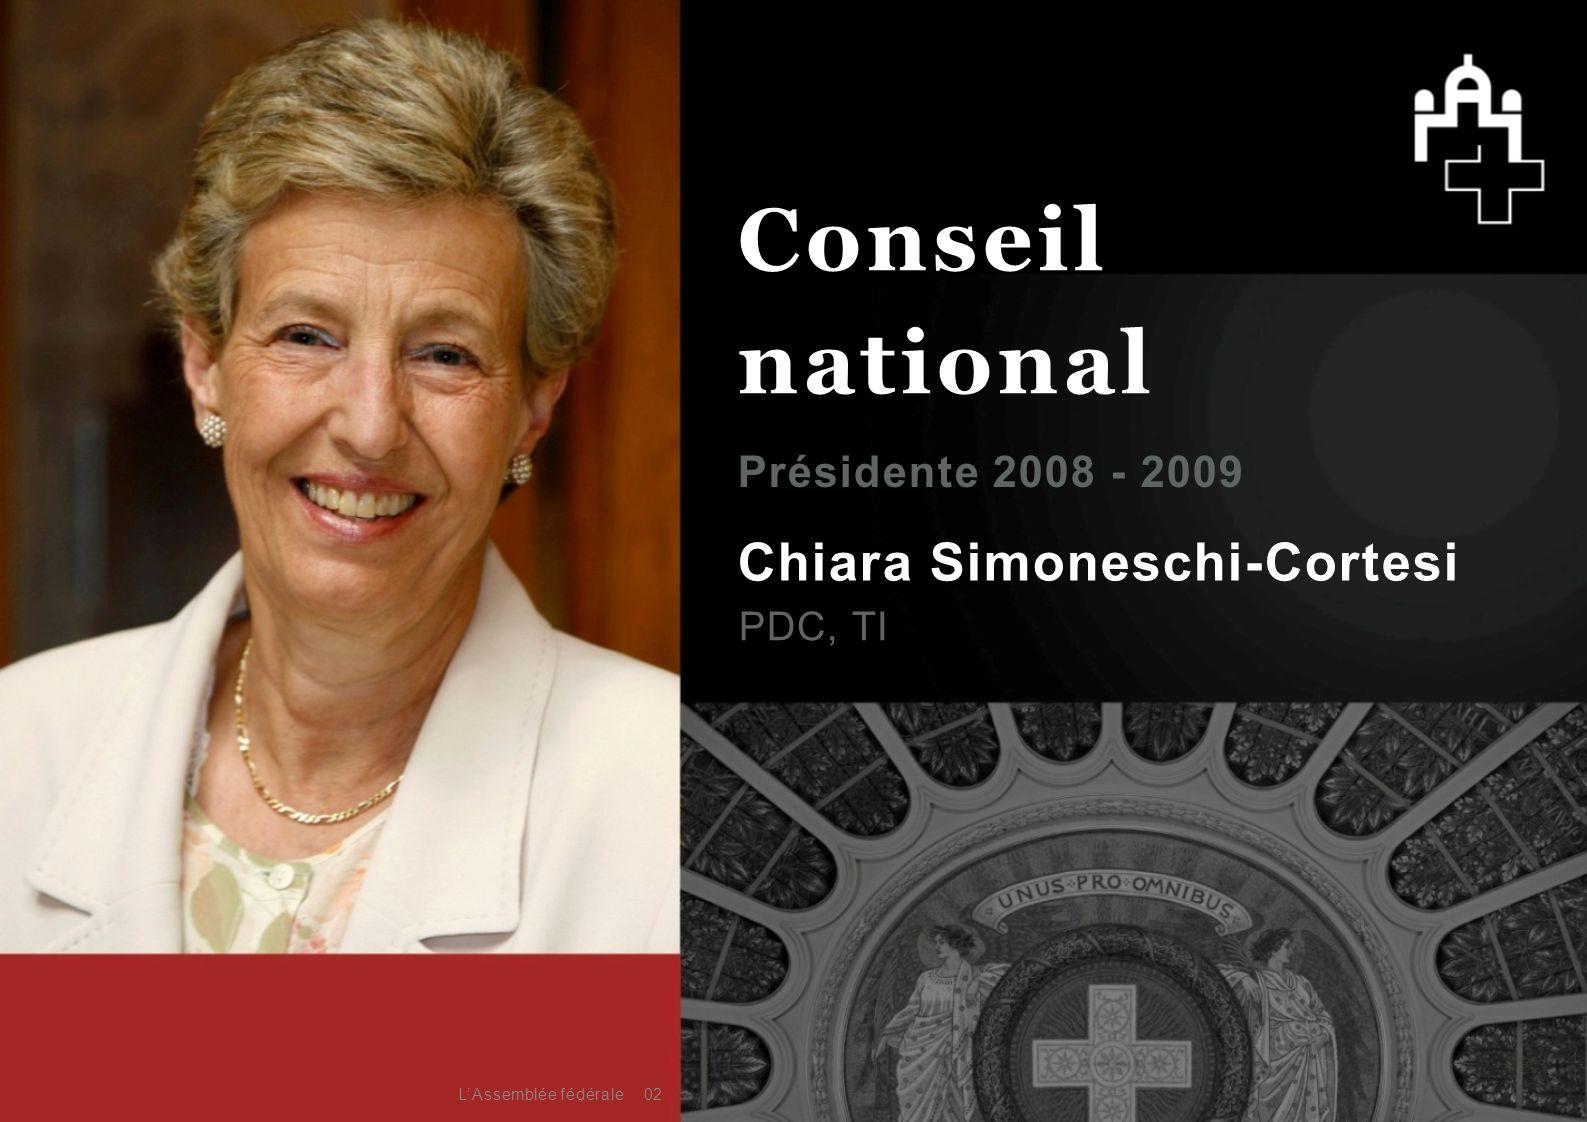 Chiara Simoneschi-Cortesi PDC, TI Présidente 2008 - 2009 02 Conseil national L'Assemblée fédérale